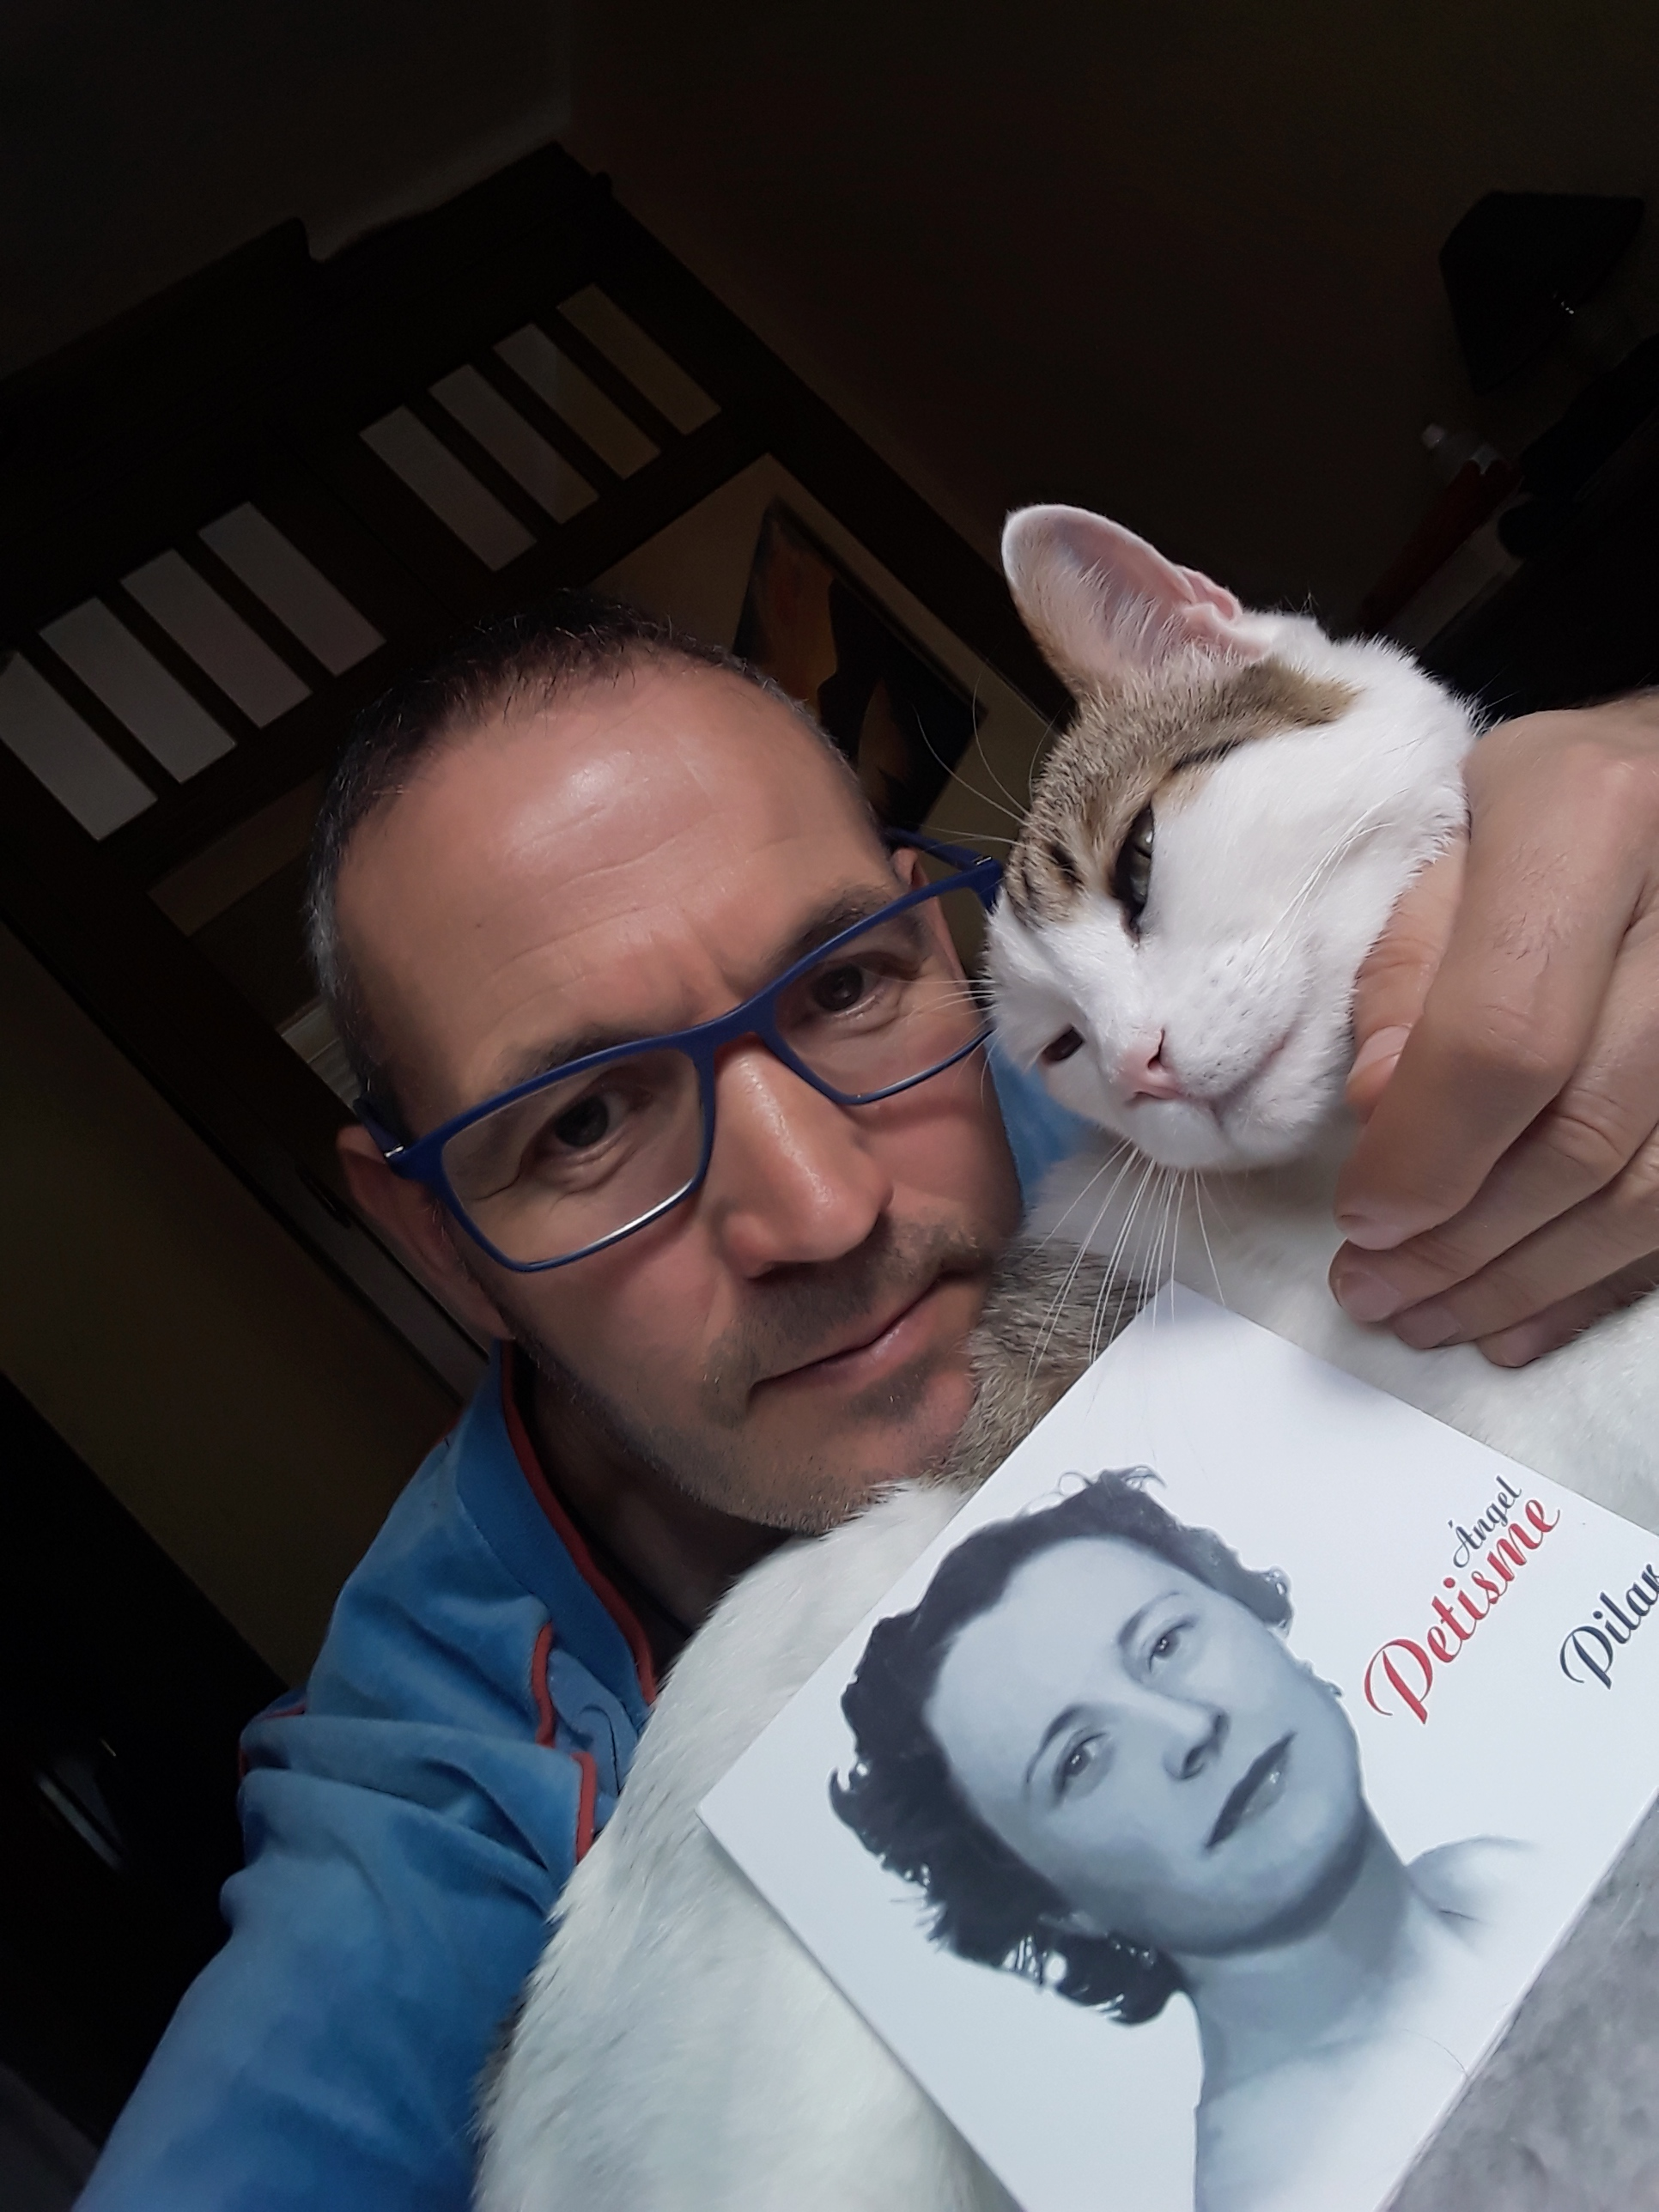 cd Pilar Coty y yo . JORGE TRASOBARES ILLUECA (ZARAGOZA) .jpg